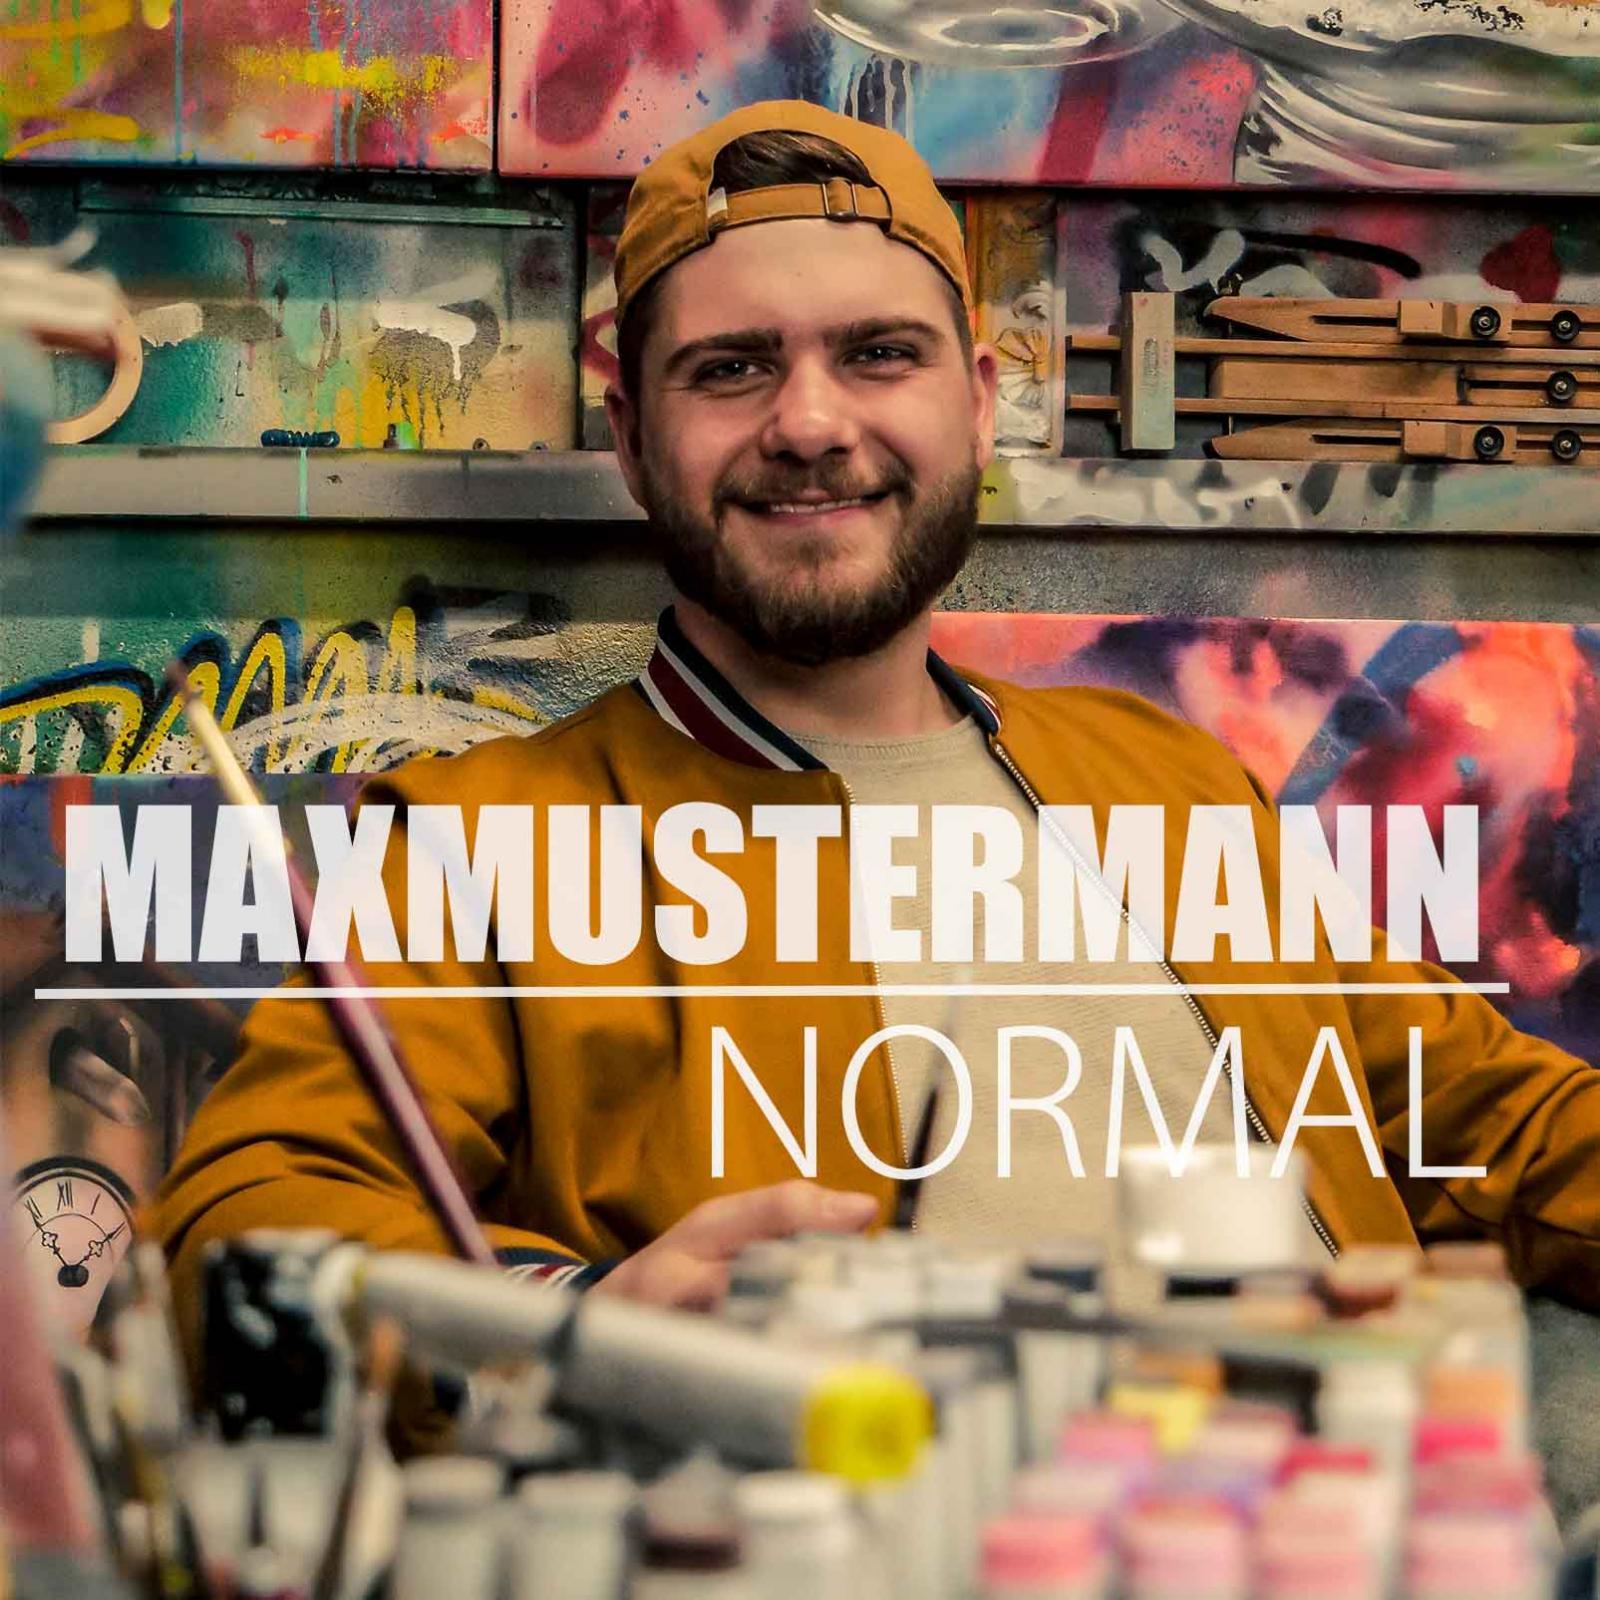 Upcoming: Maxmustermann - Normal